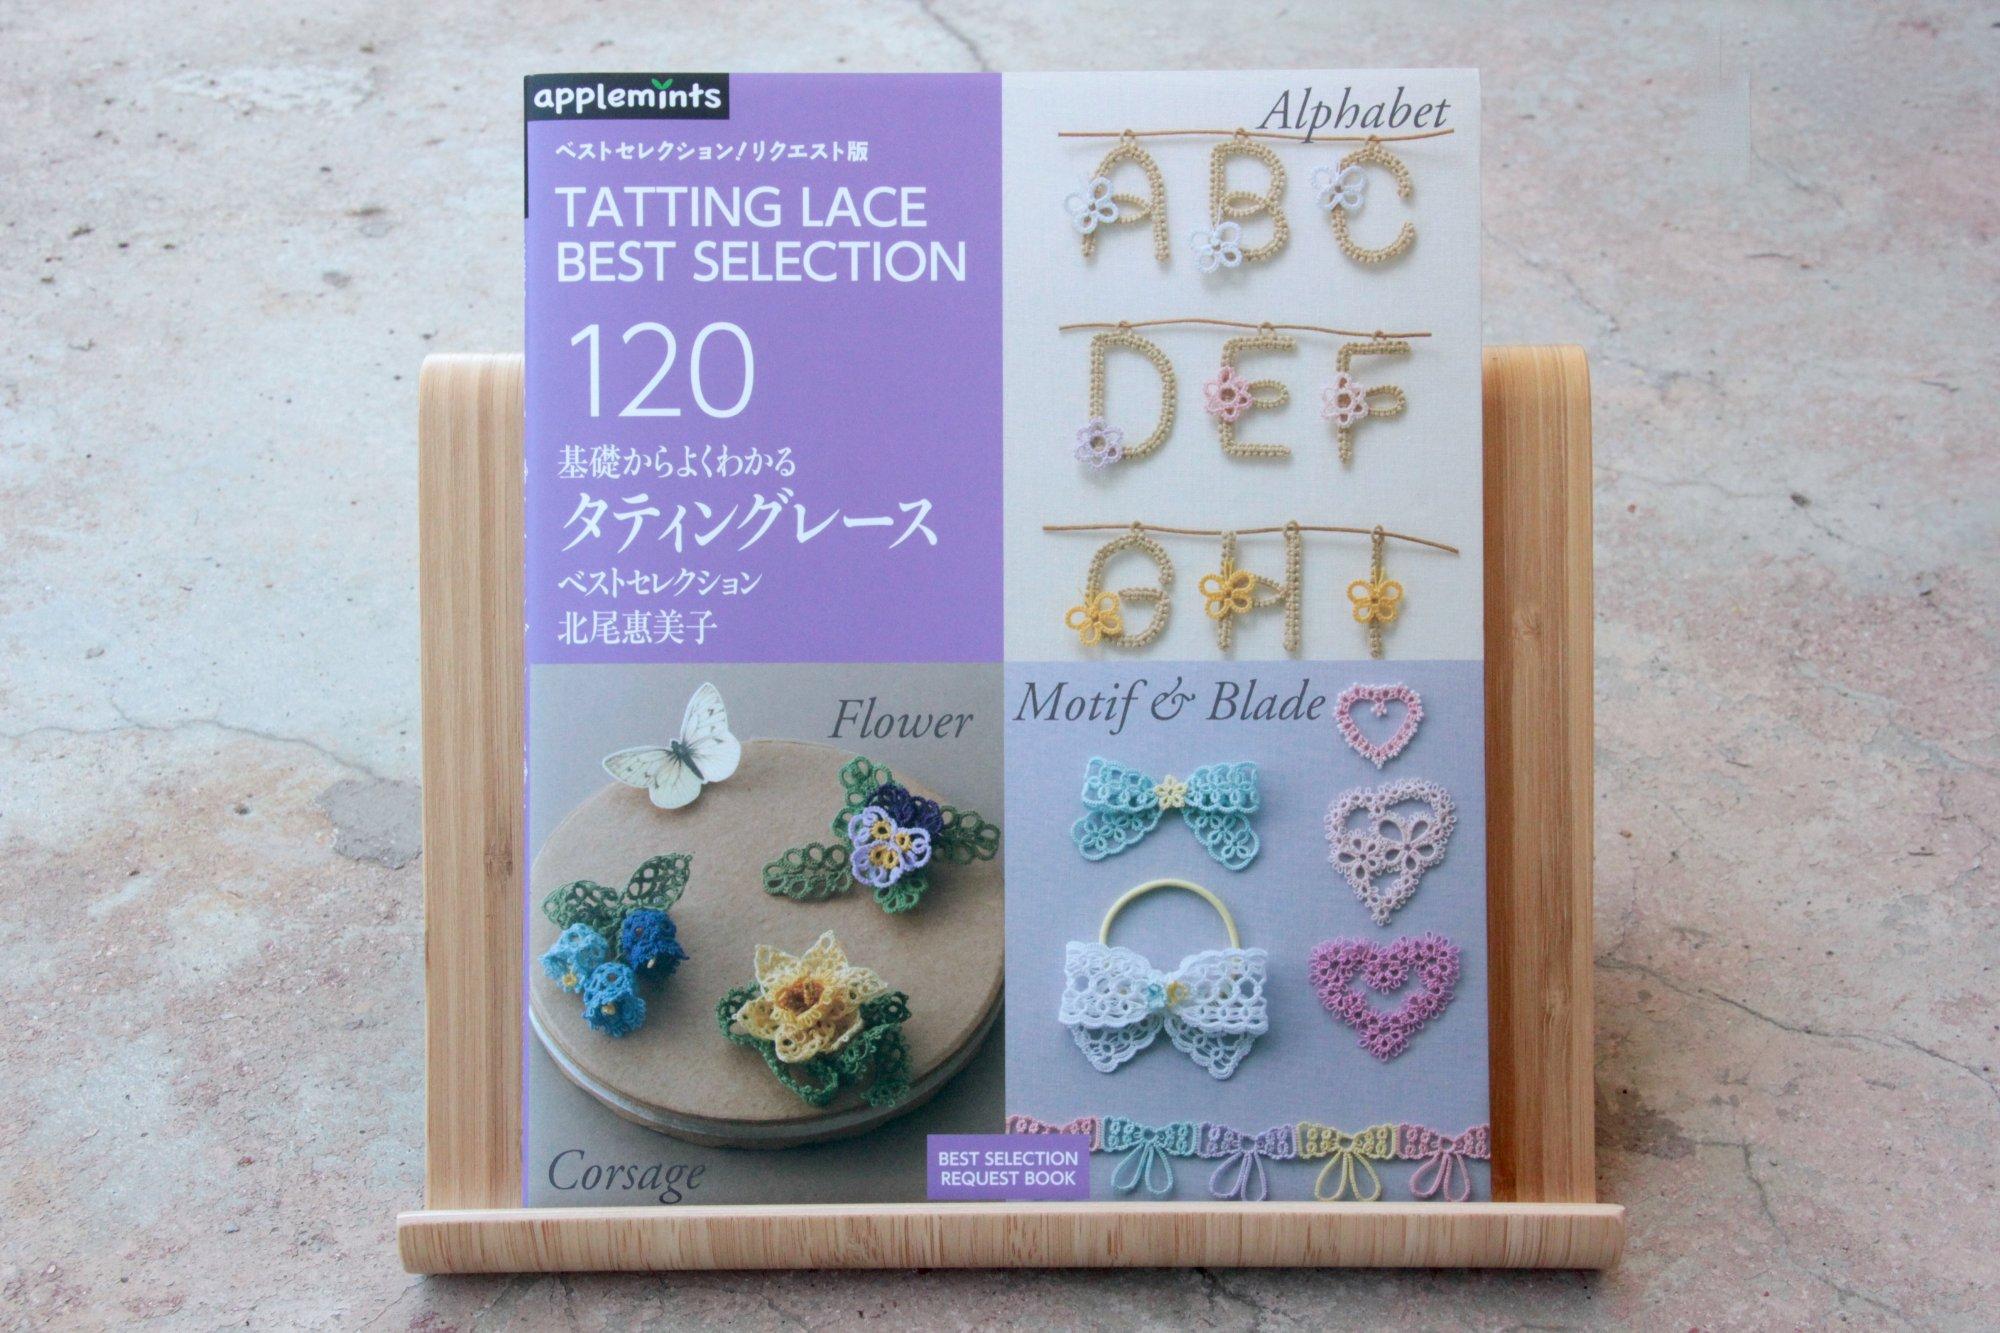 Tatting Lace Best Selection (Japanese)